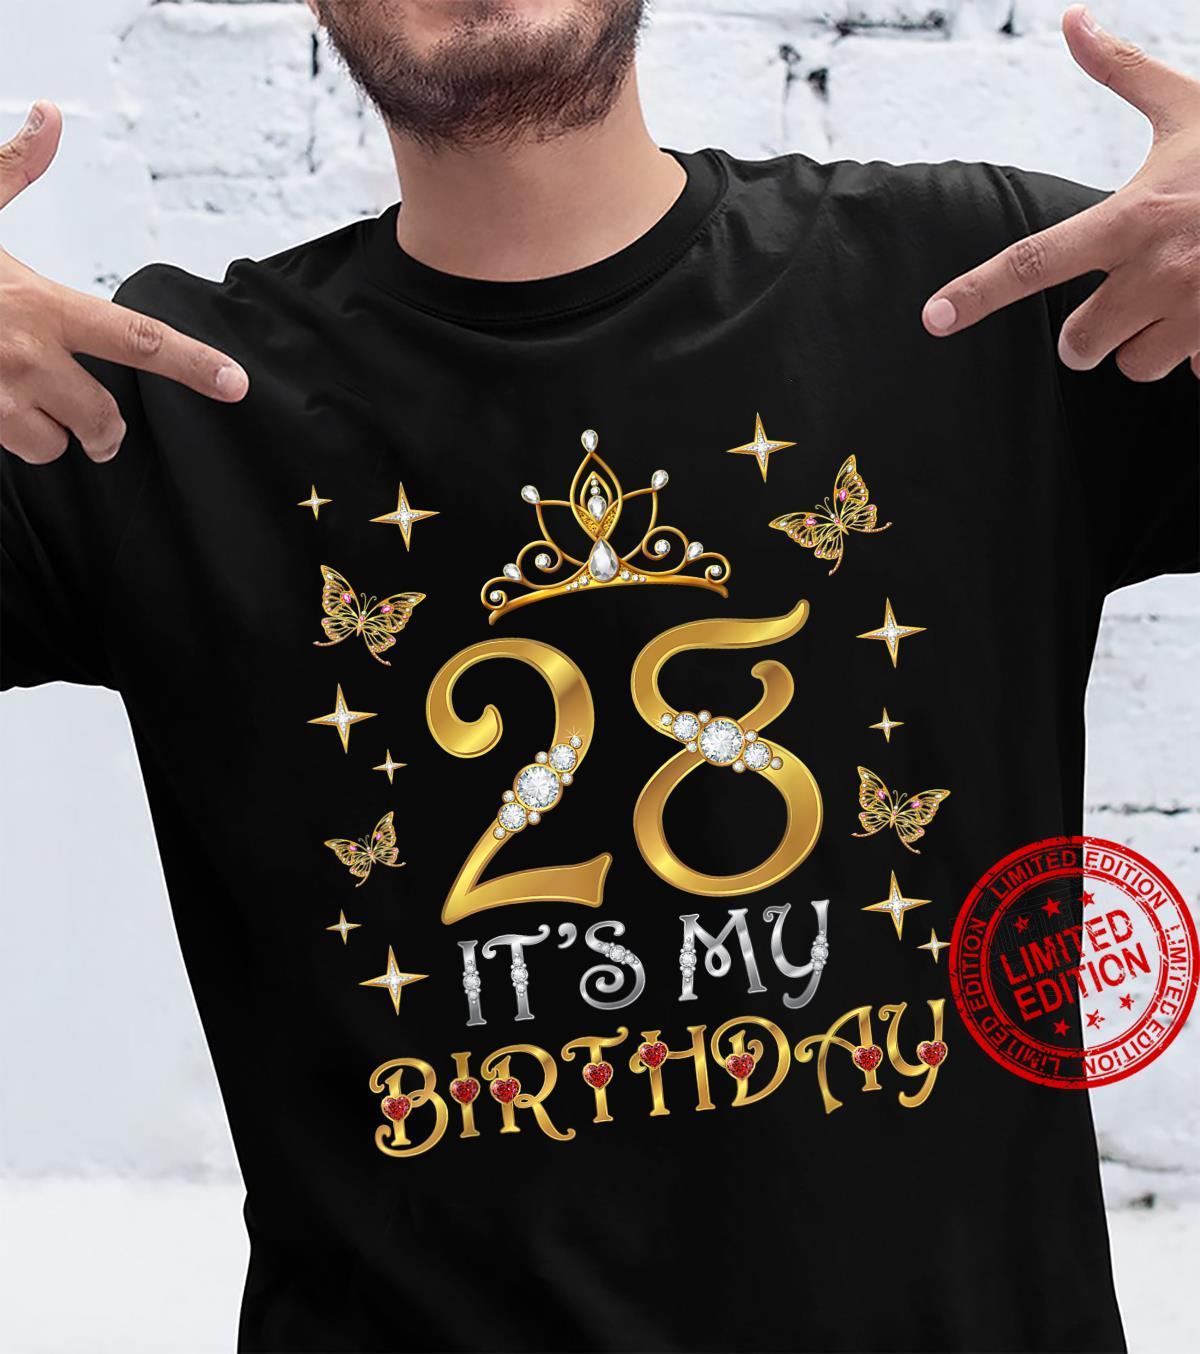 28th It's My Birthday, It's My 28th Birthday, 28 Years Old Shirt